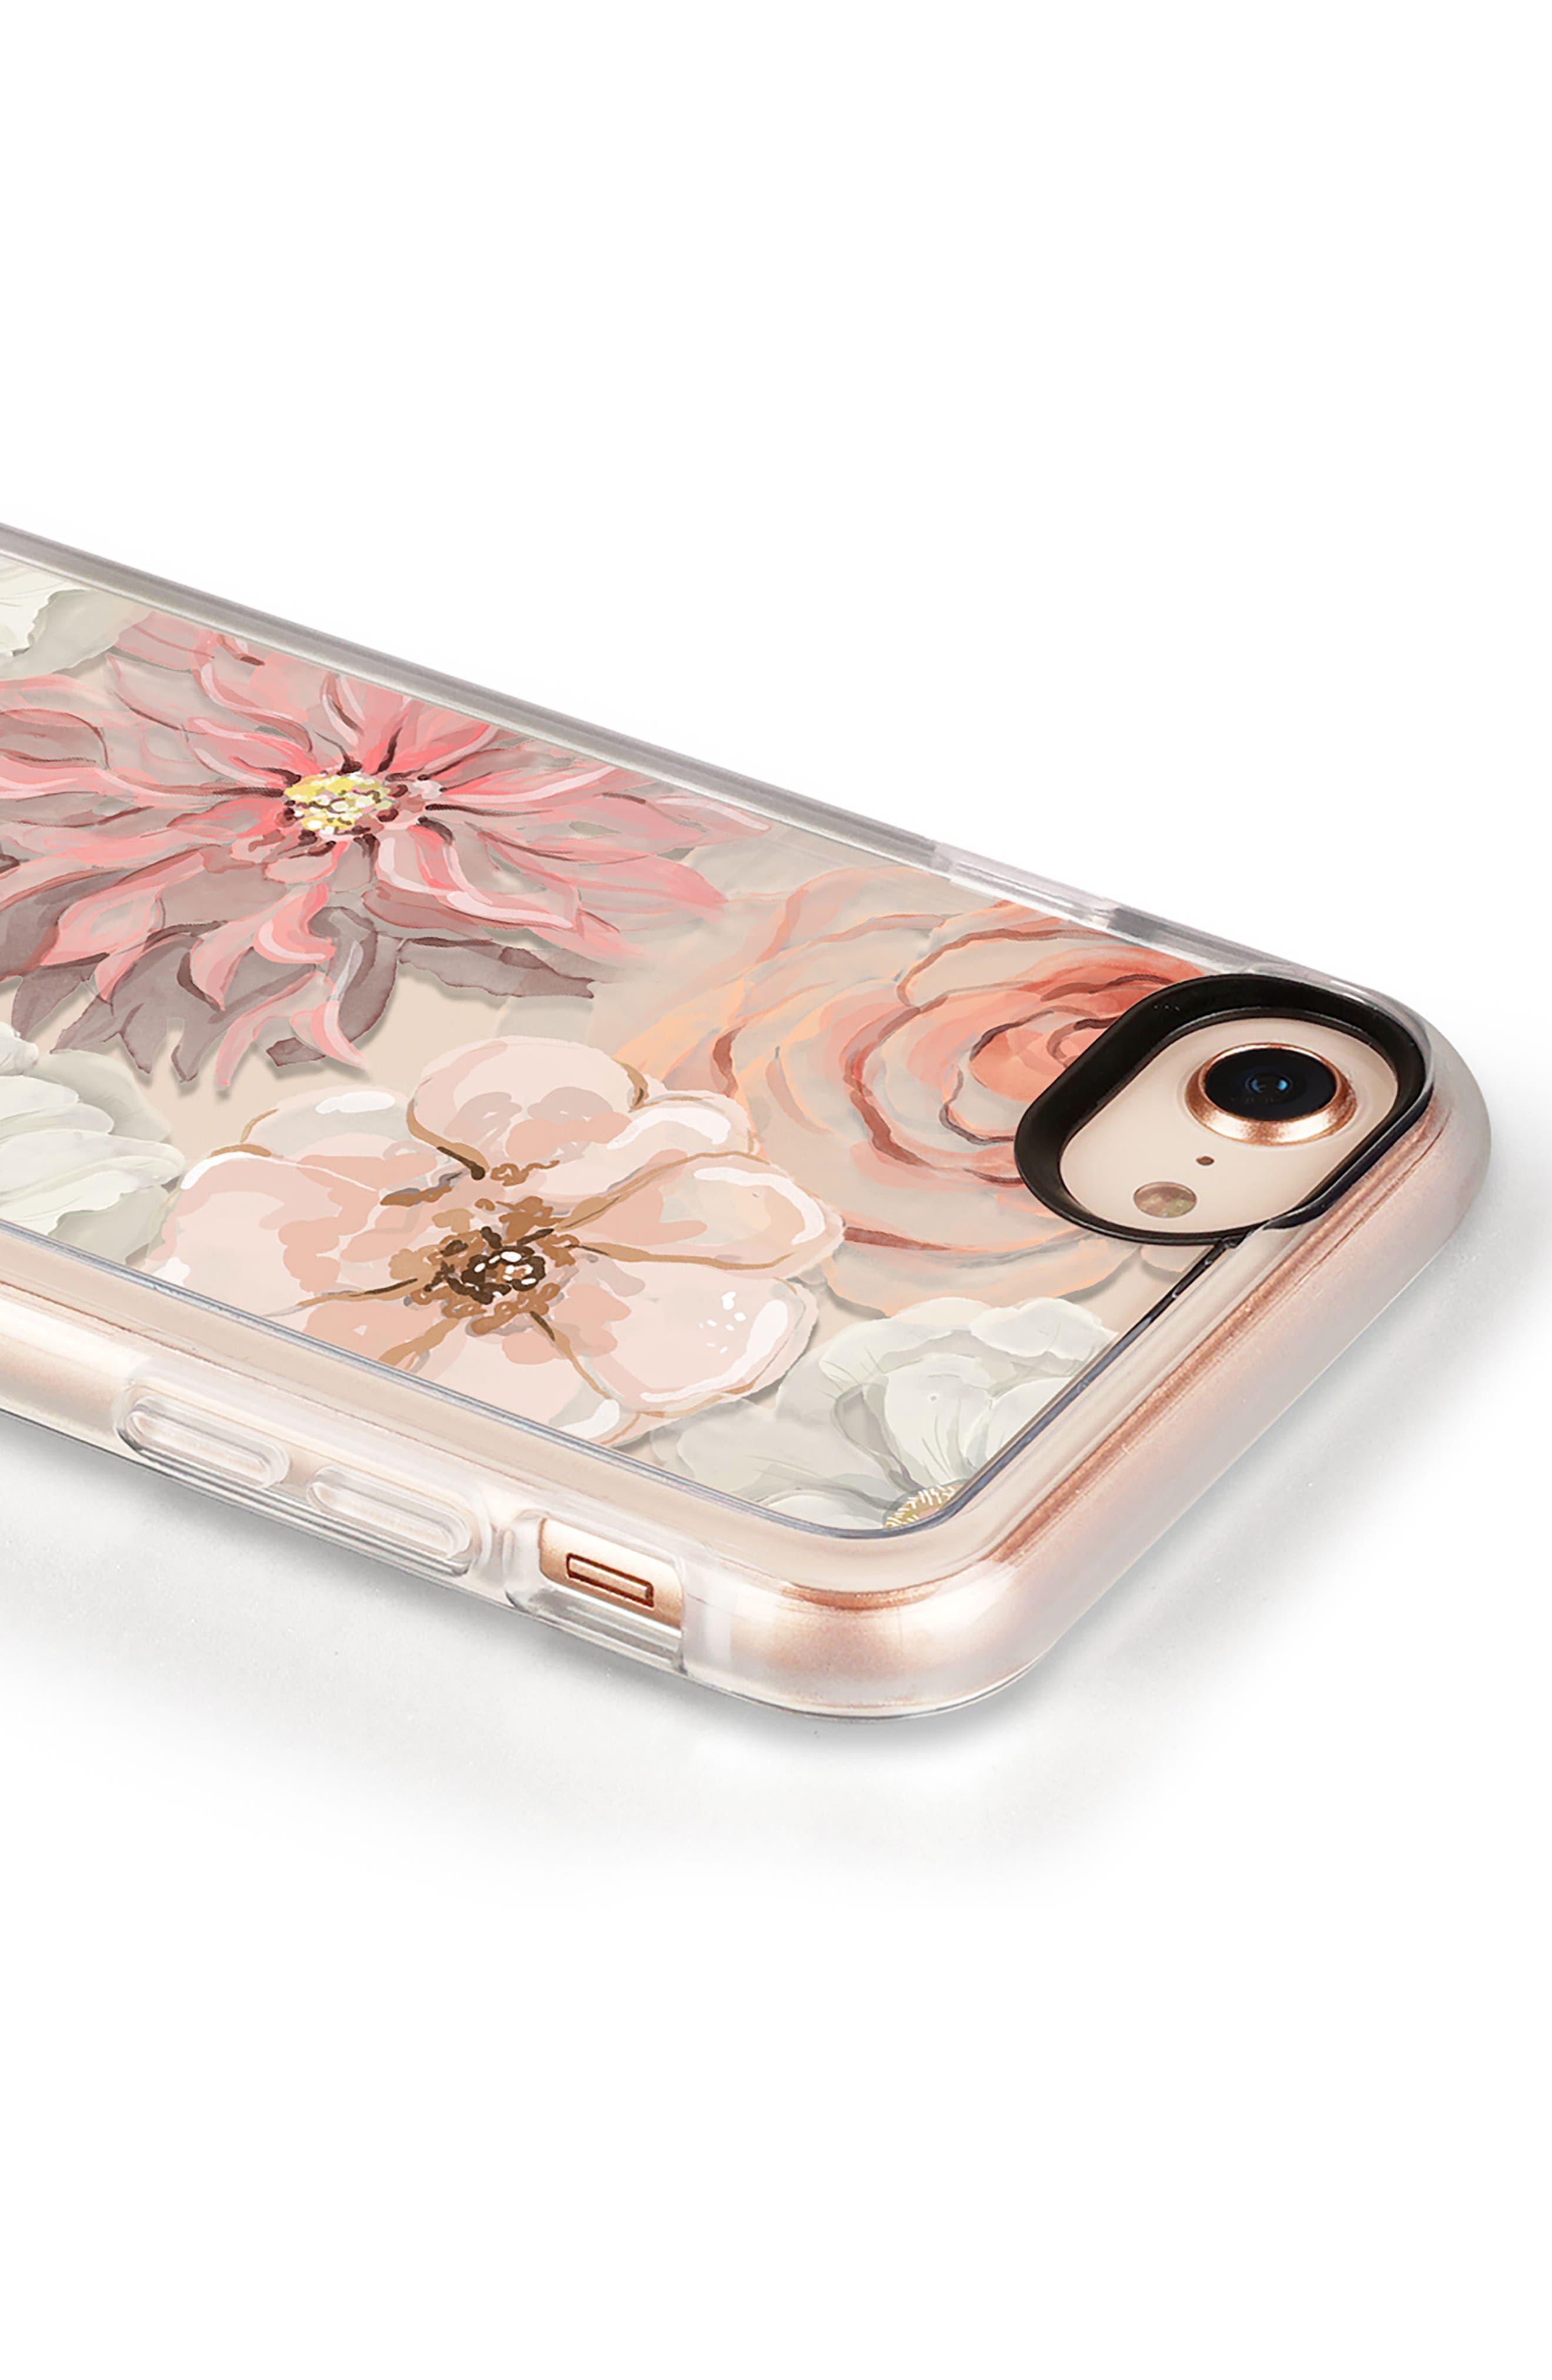 Pretty Blush iPhone 7/8 & 7/8 Plus Case,                             Alternate thumbnail 4, color,                             BLUSH PINK